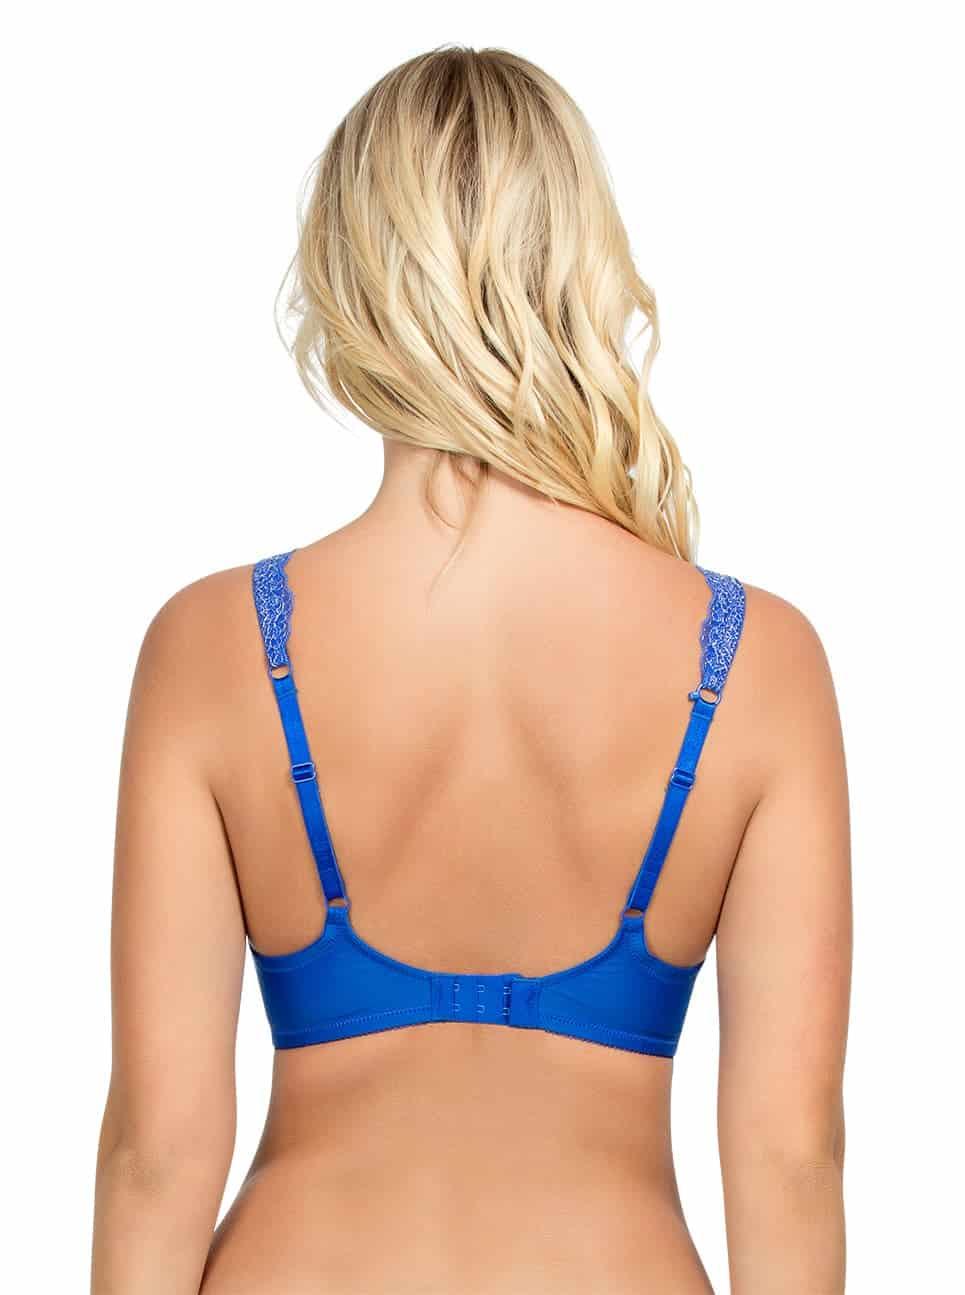 Allure Padded Bra - Dazzling Blue - A1491